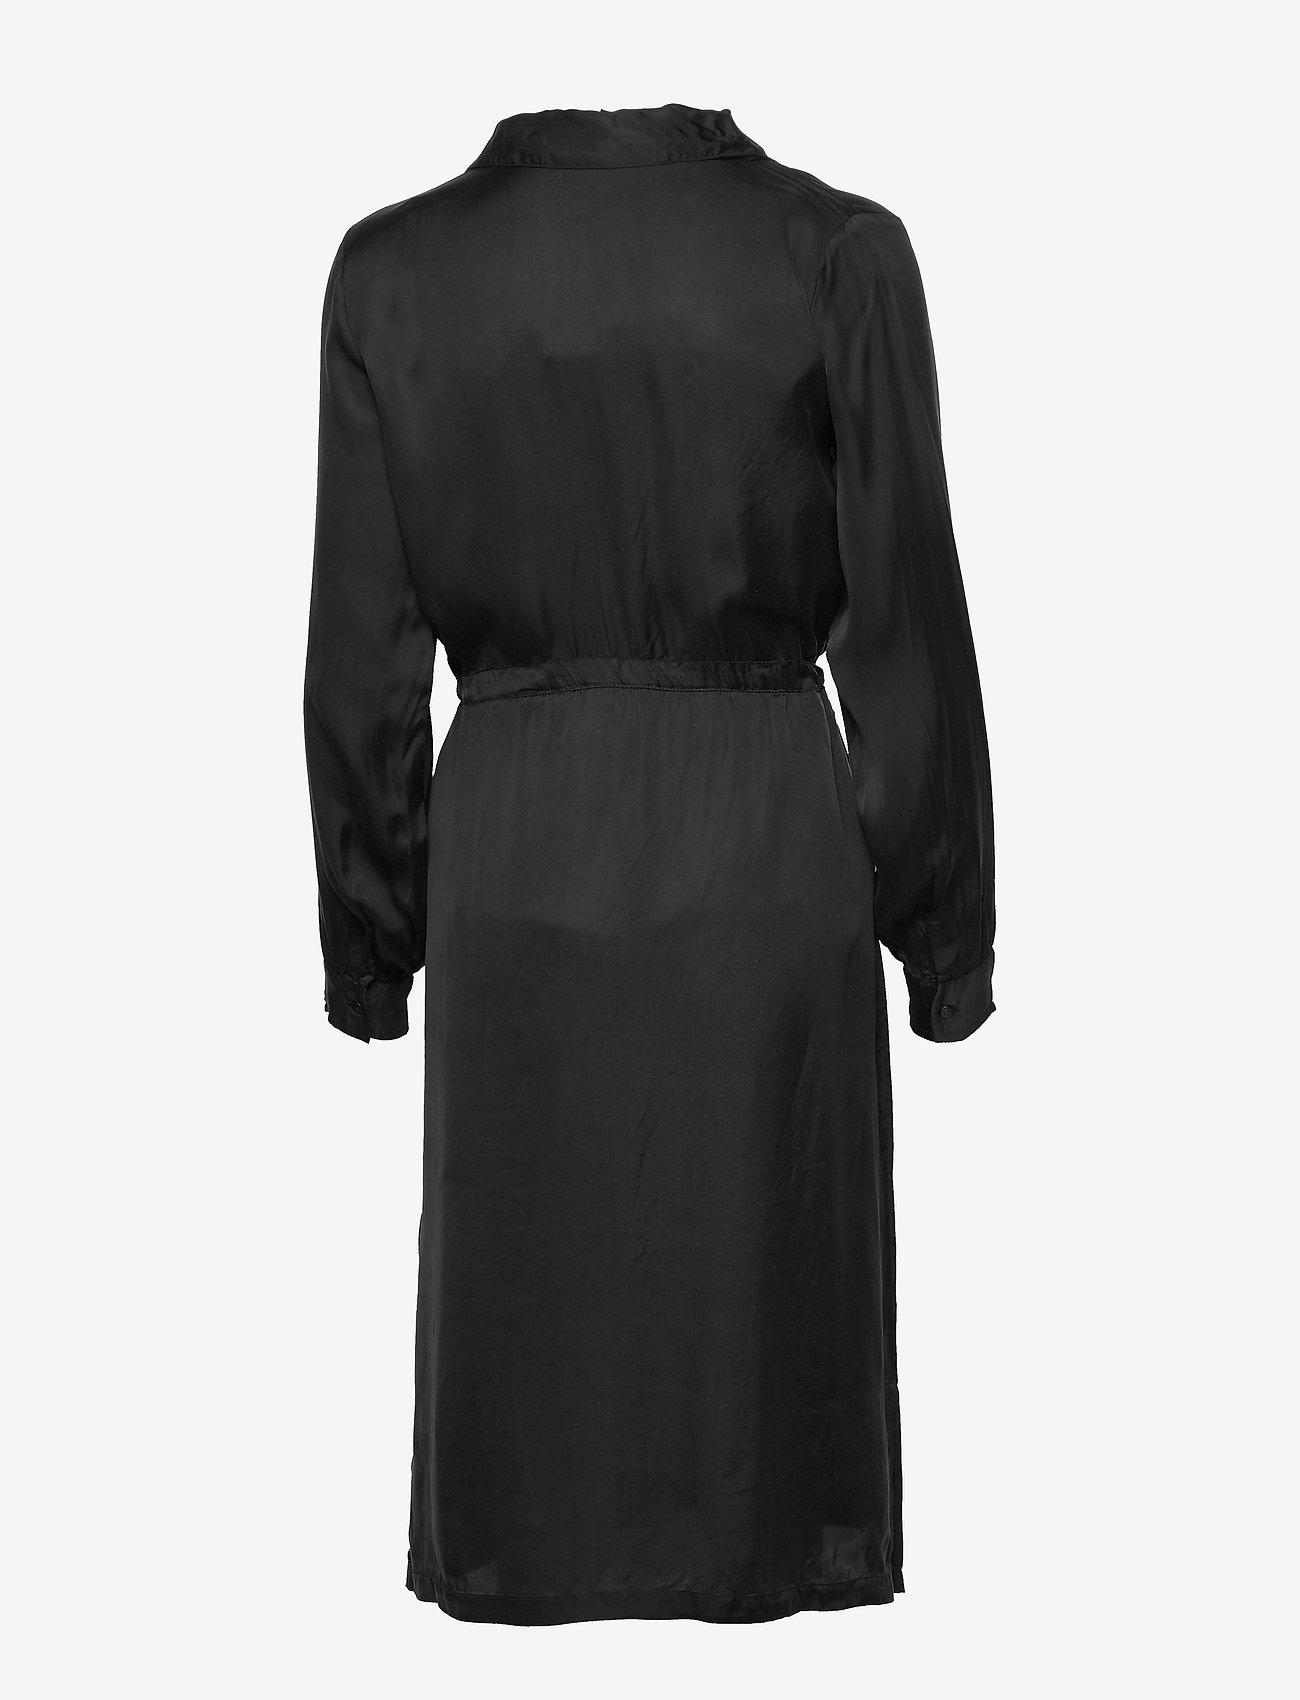 NÜ Denmark - Camira Dress pockets - shirt dresses - black